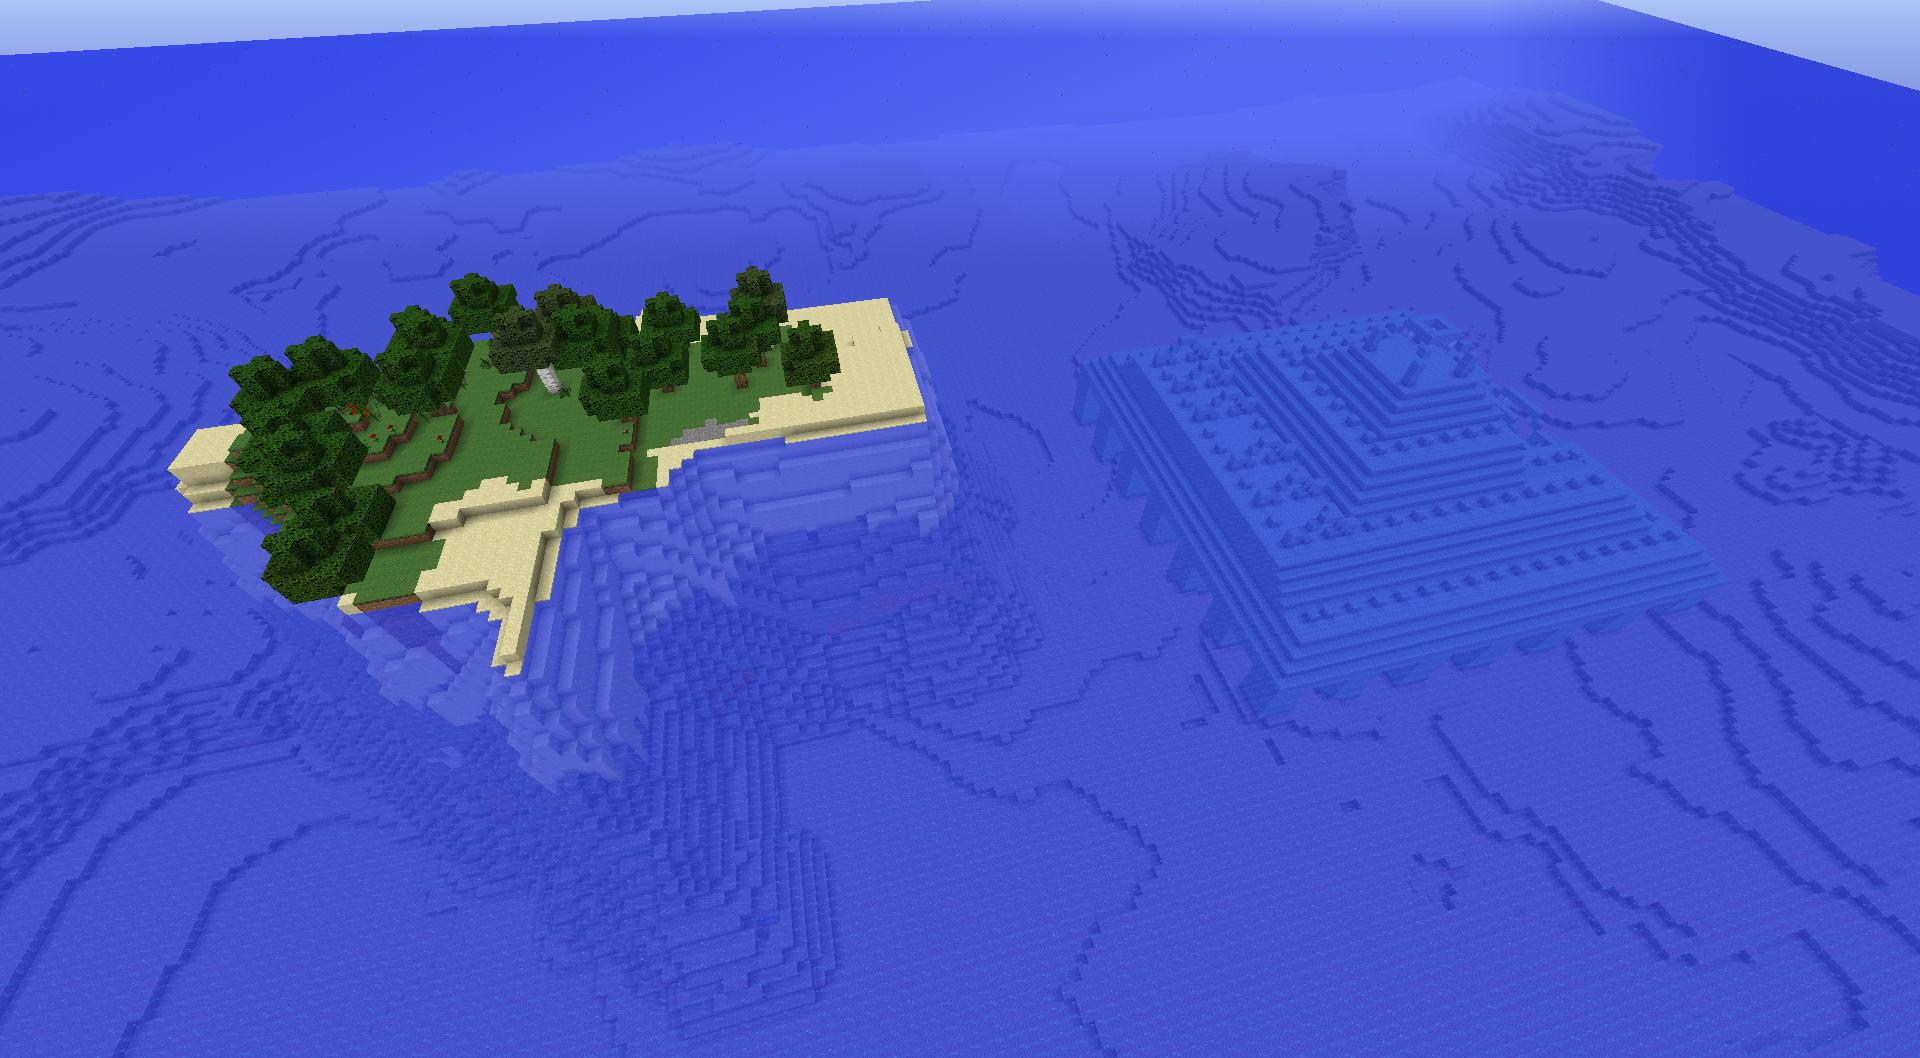 comment trouver temple sous marin minecraft